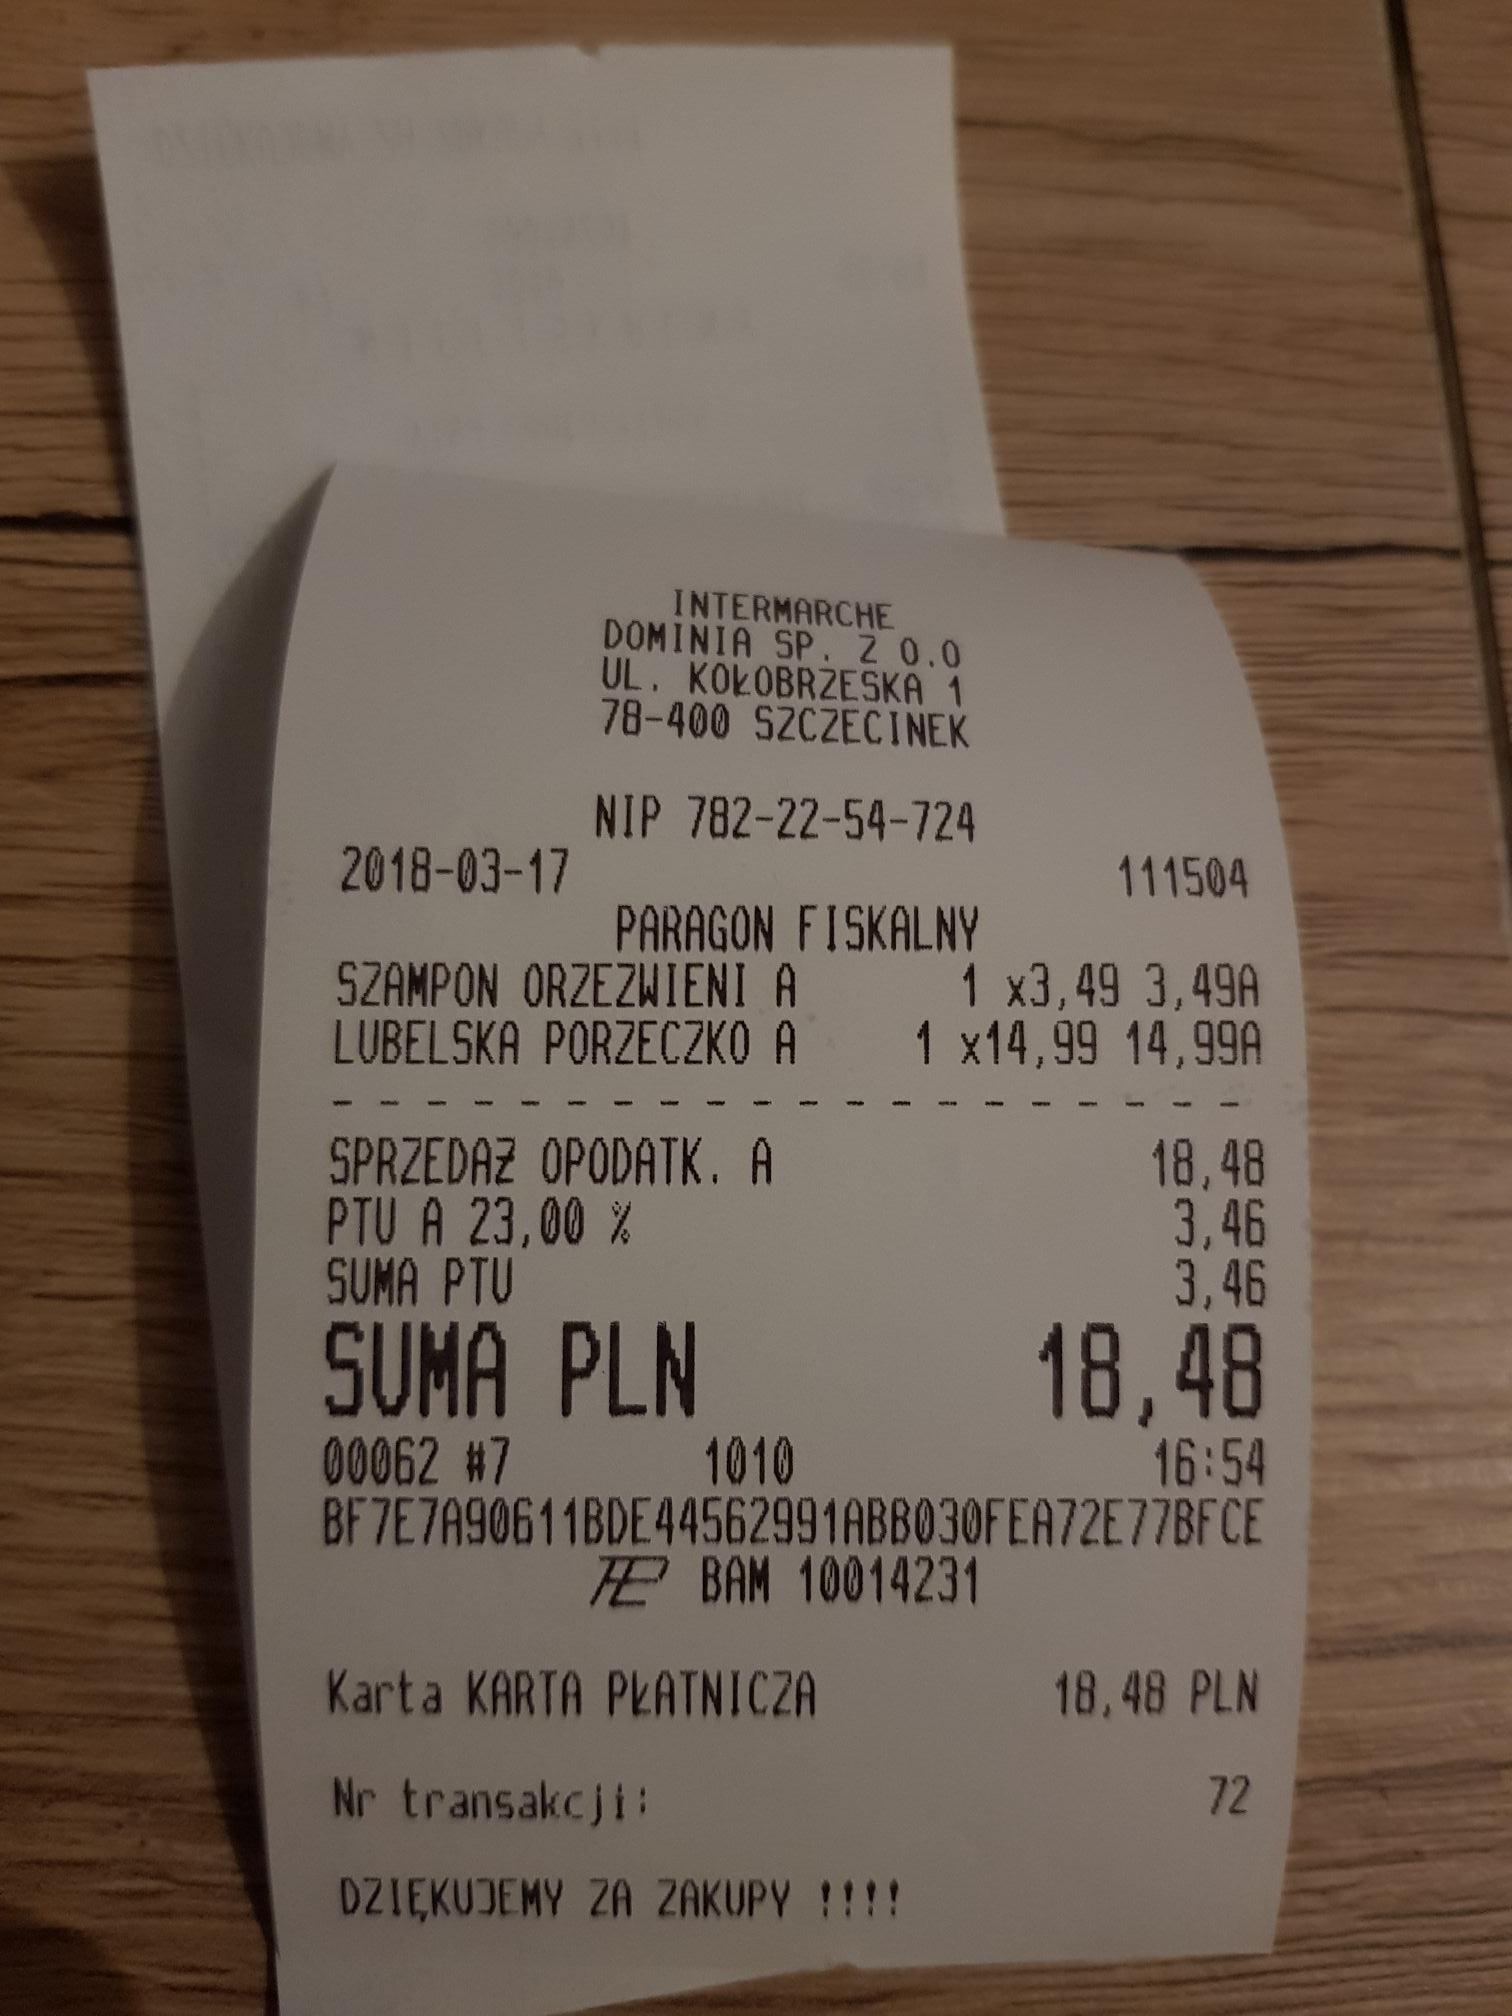 Intermarche lubelskie likiery smakowe 0.5l  30%